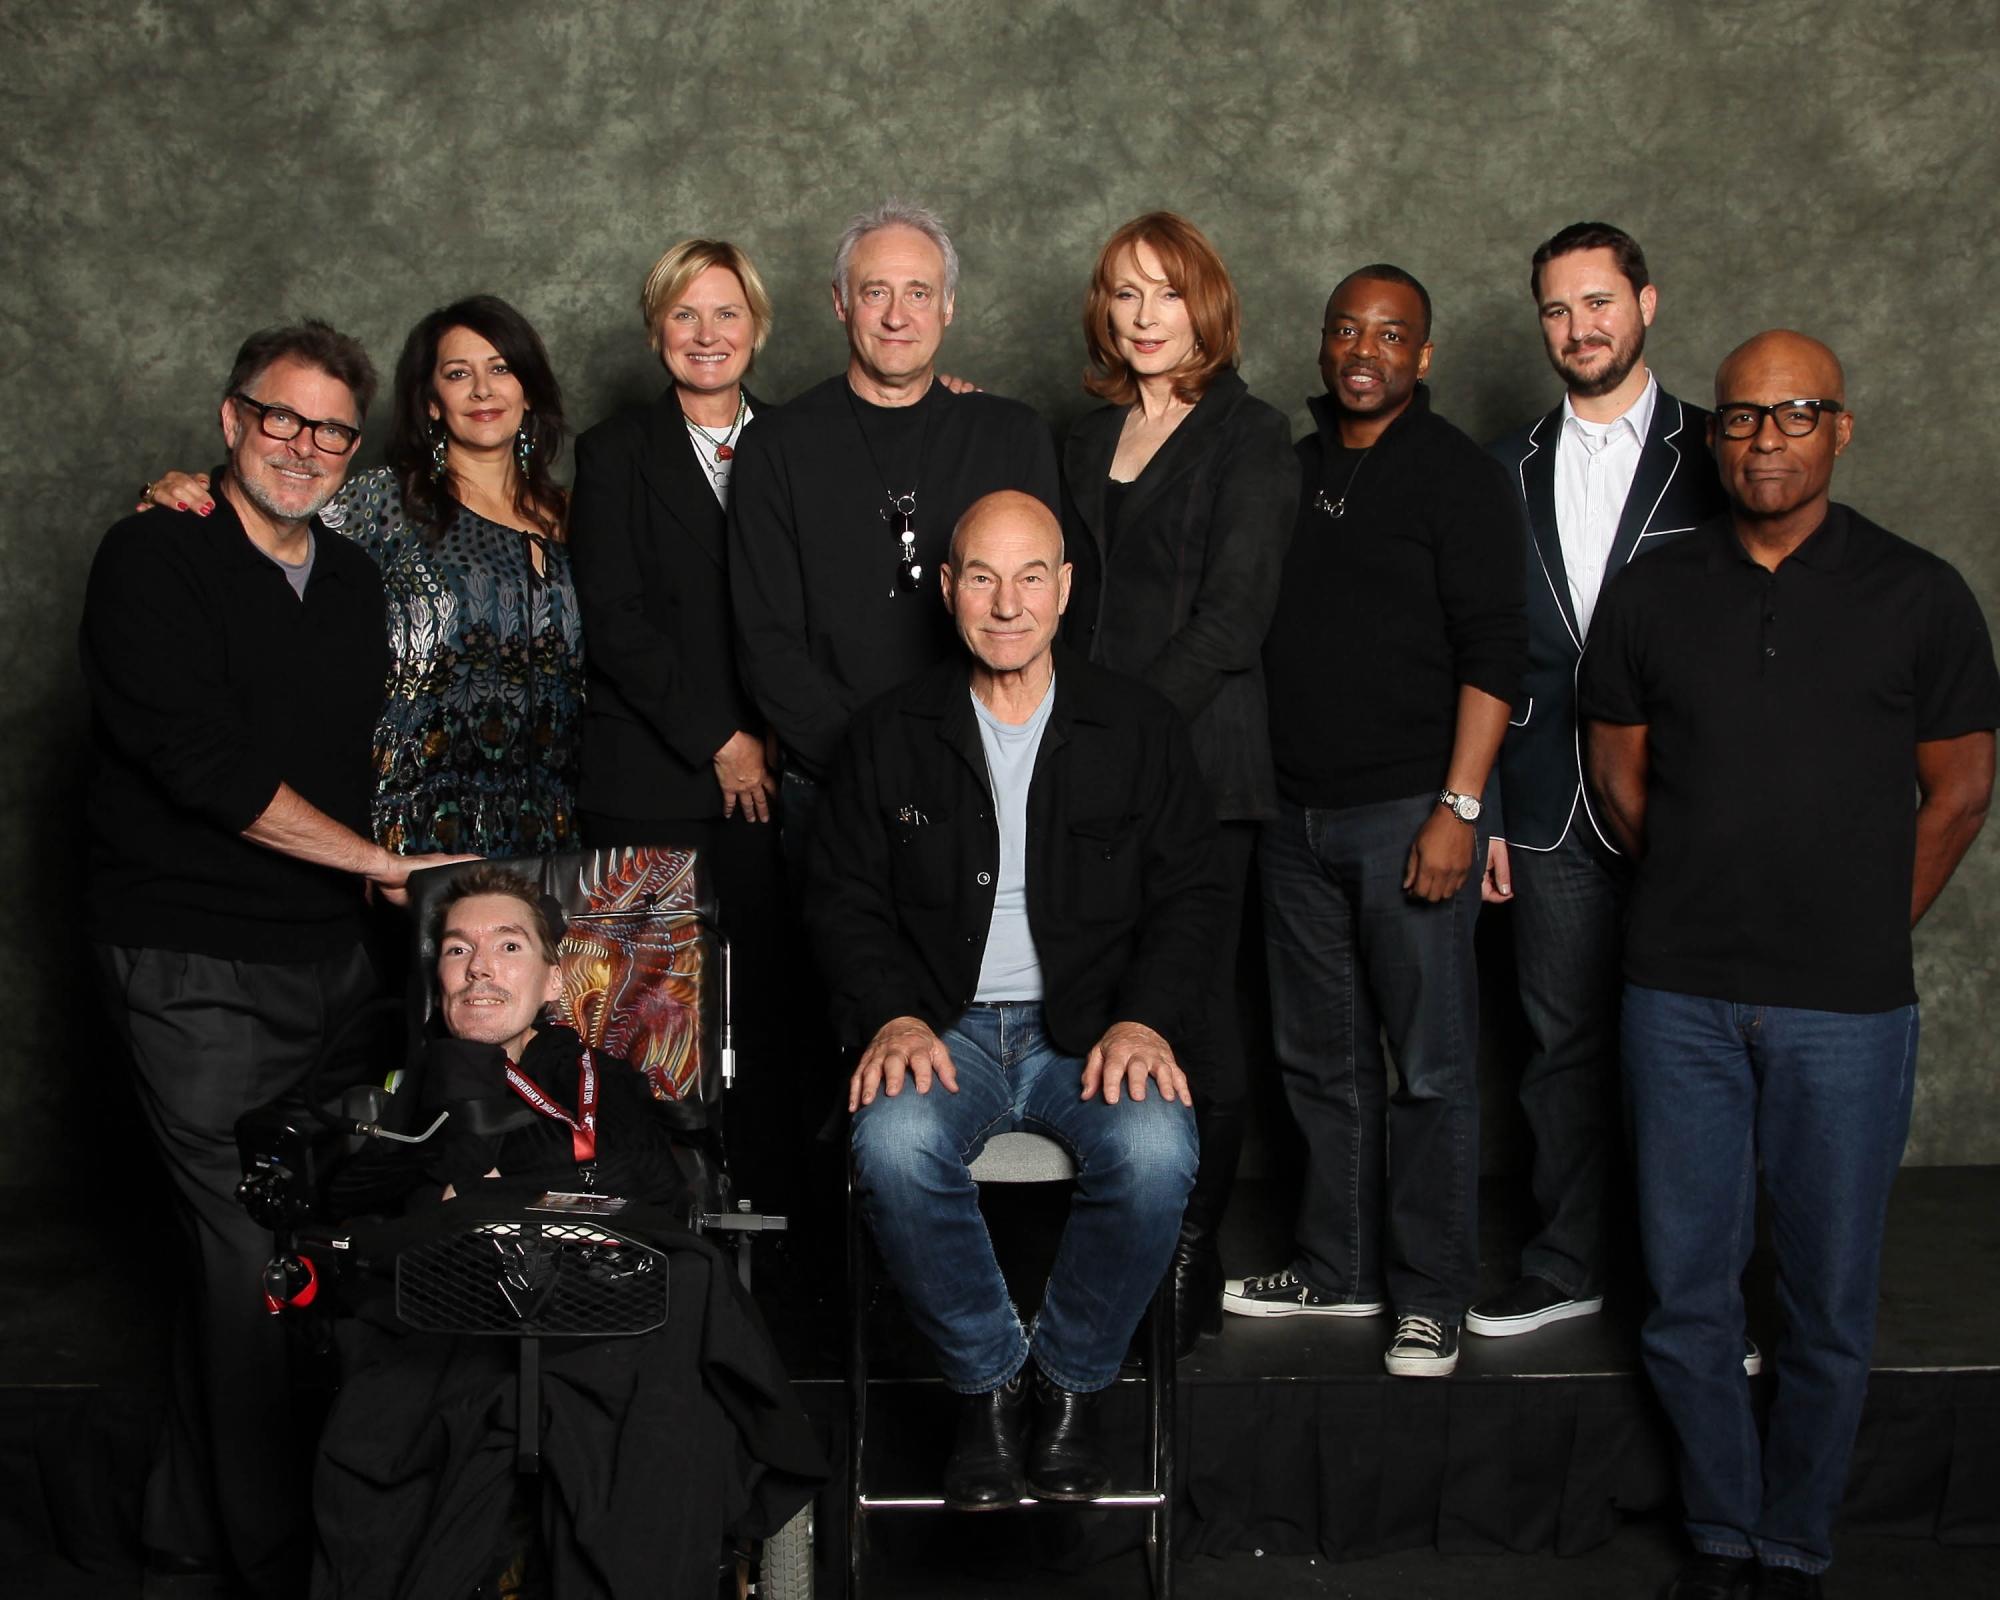 Tom and the Star Trek: TNG cast